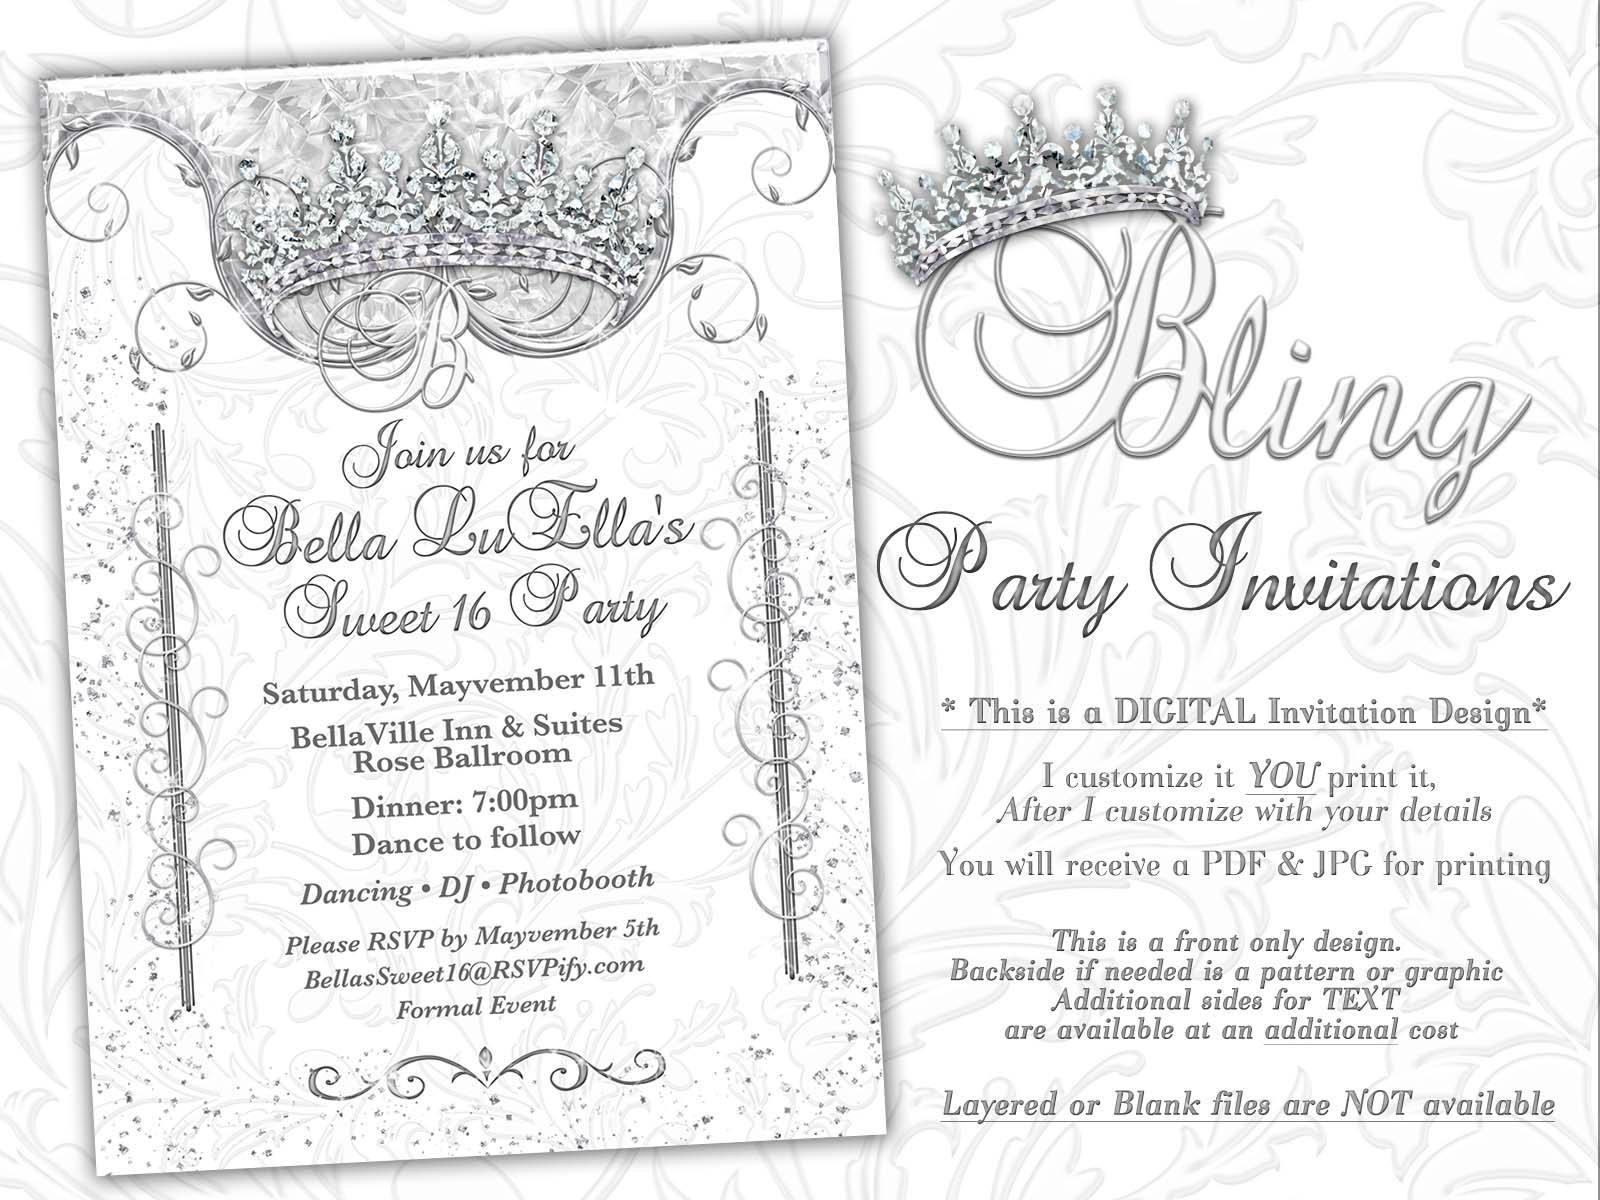 Bling diamond party invitations quinceanera invitation party bling diamond party invitations quinceanera invitation party invitations sweet 16 party mis quince anos white diamond bling theme stopboris Gallery